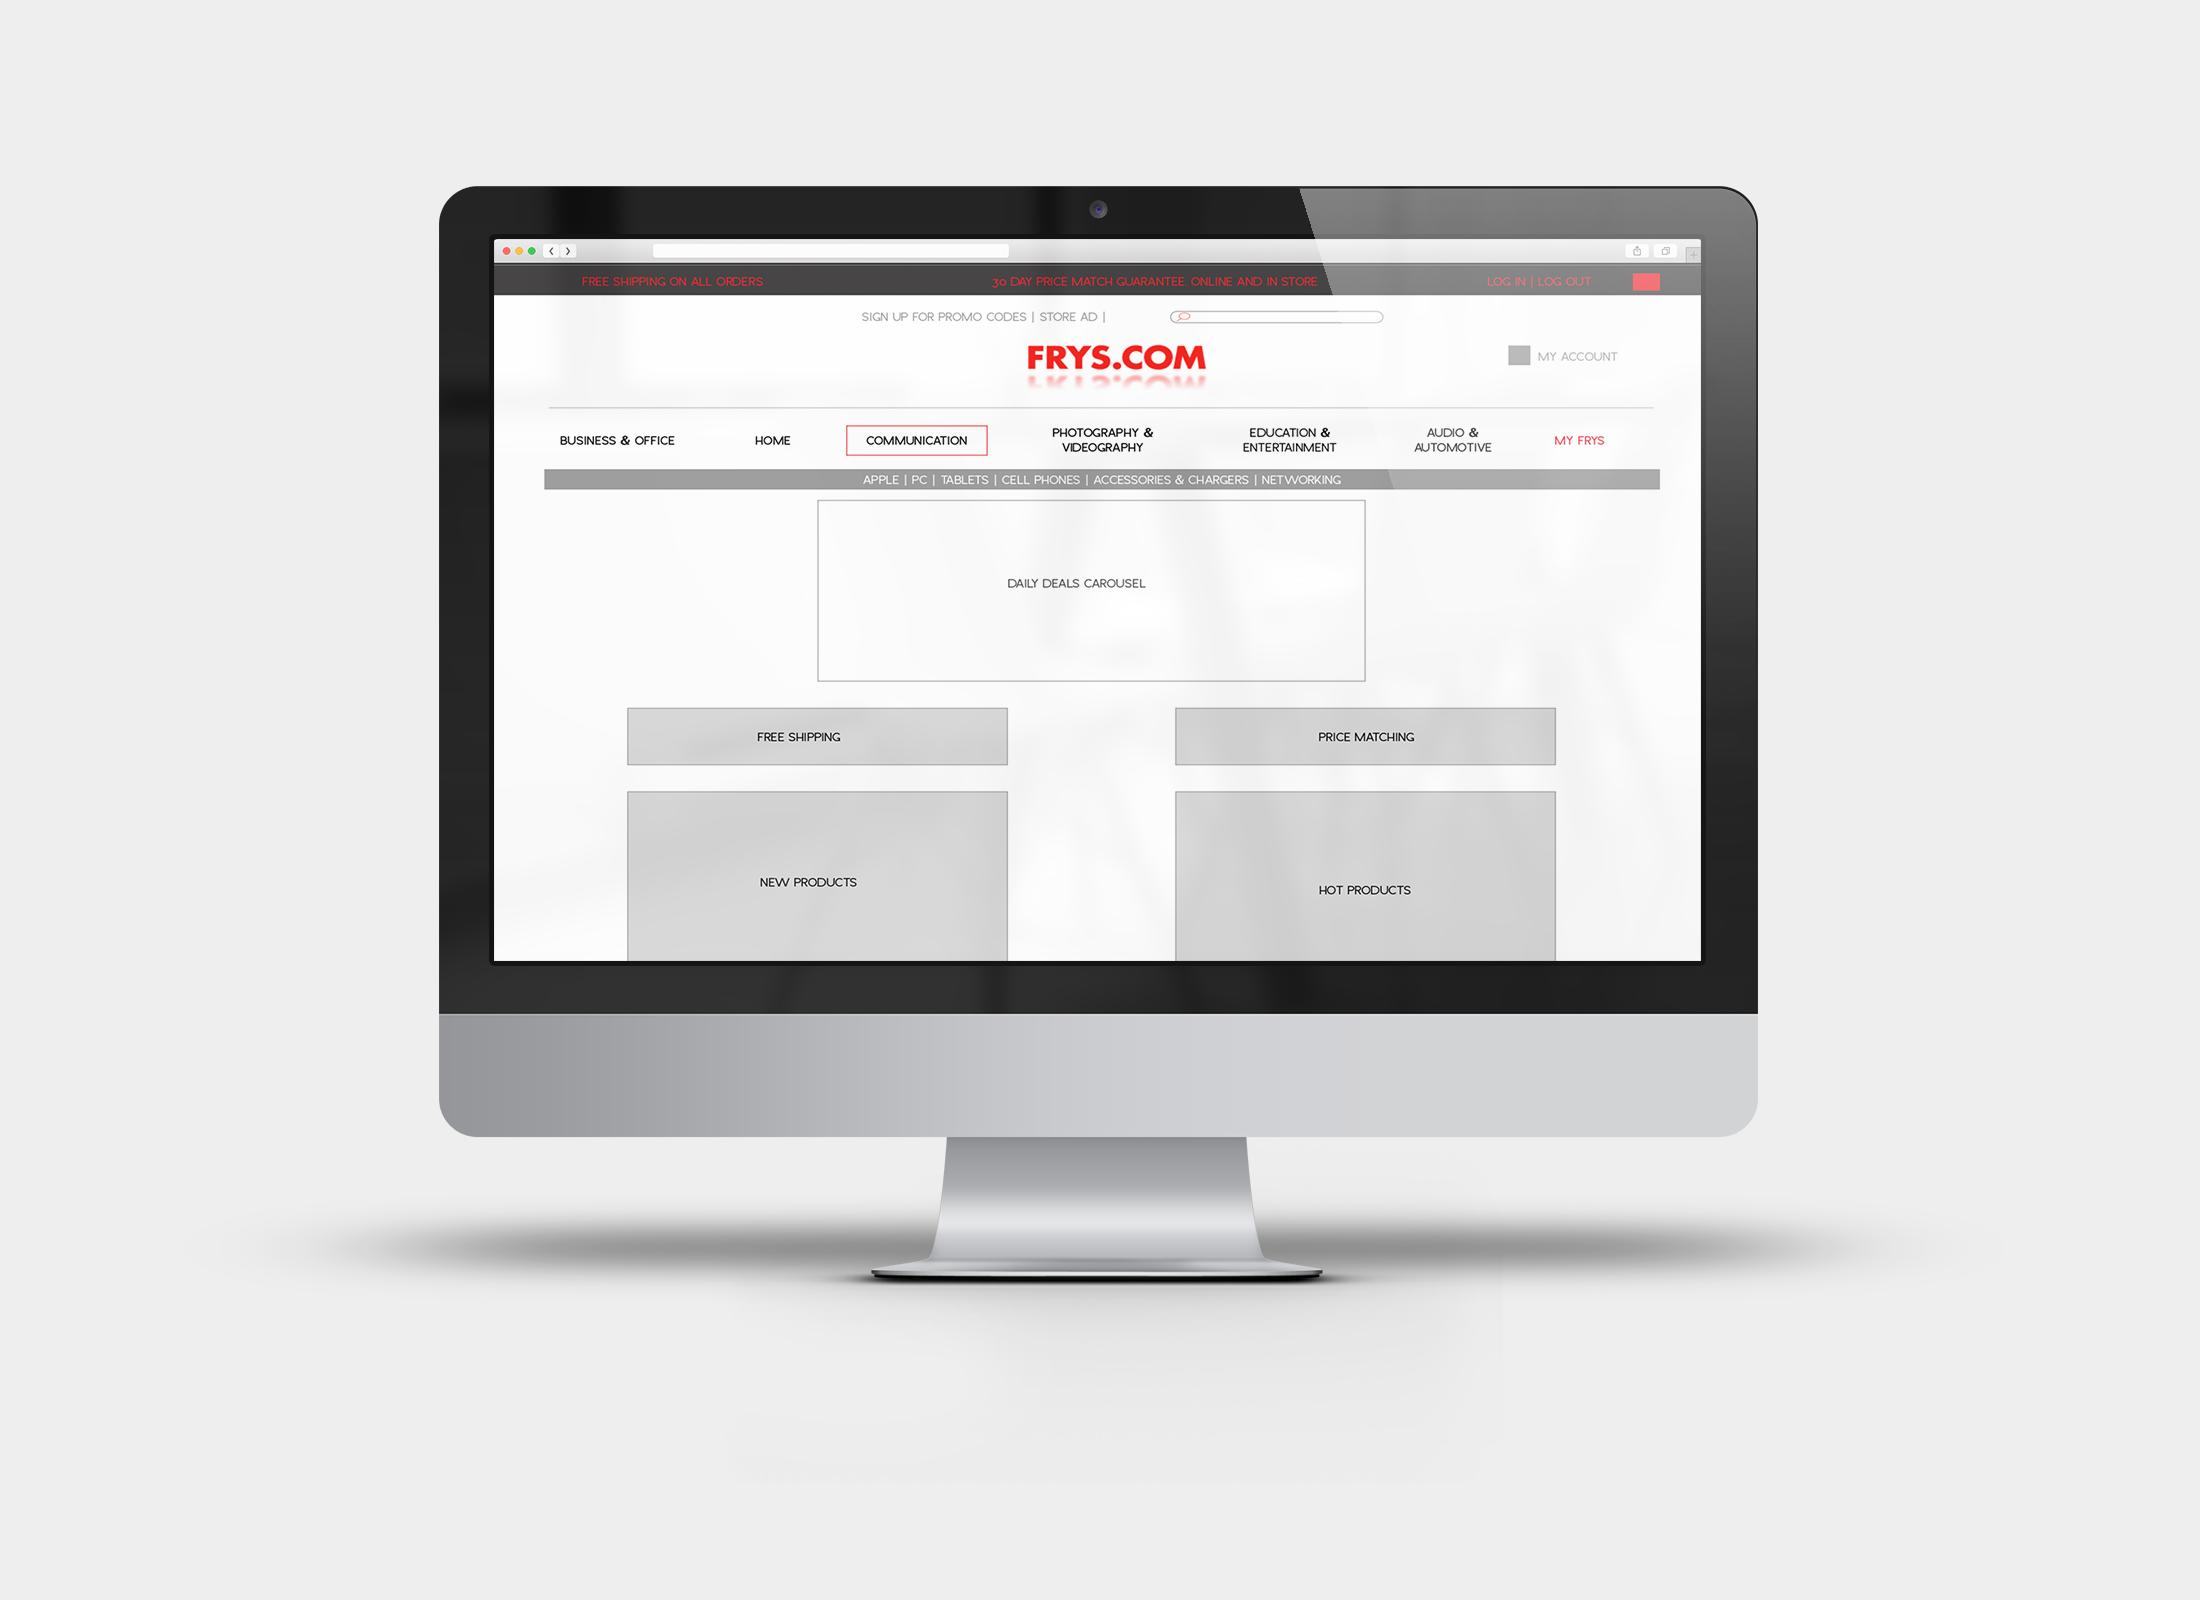 Frys.com - Speculative e-commerce checkout redesign